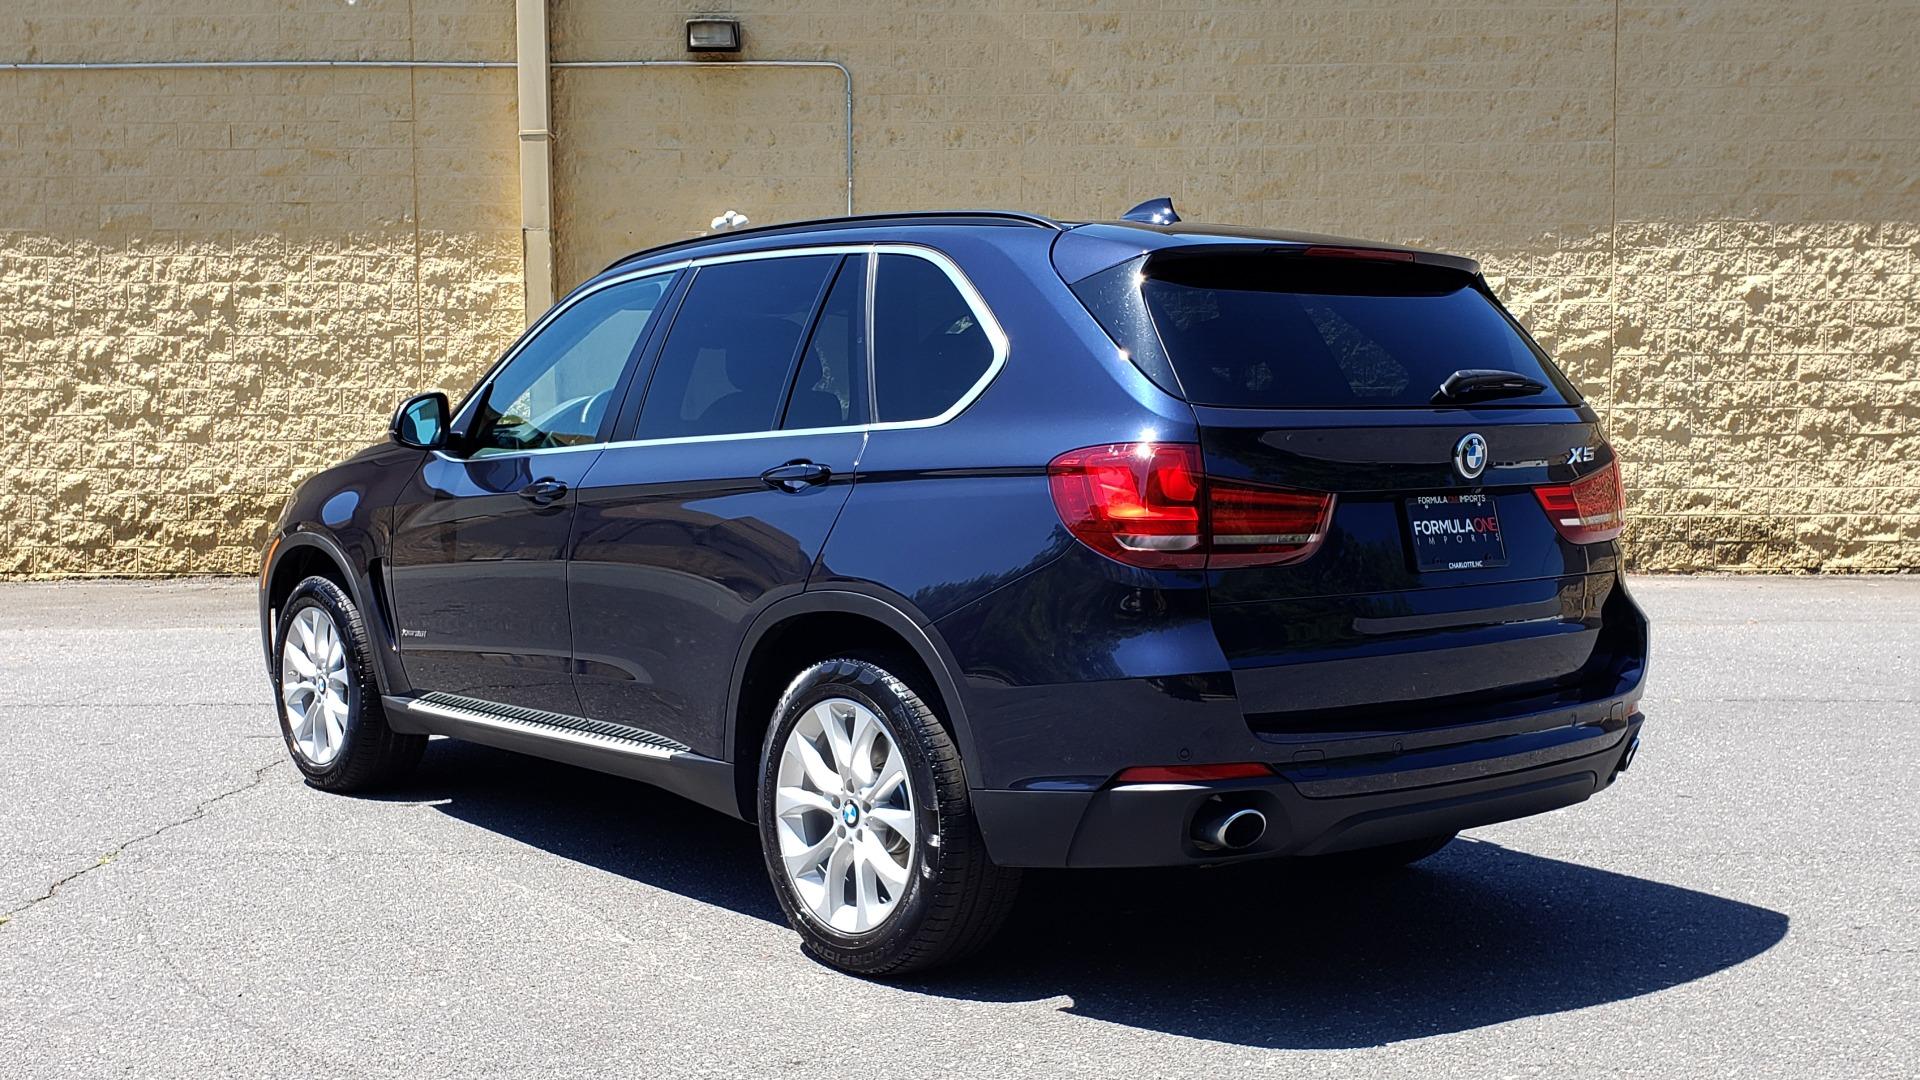 Used 2016 BMW X5 XDRIVE35I / PREM PKG / NAV / DRVR ASST PLUS / REARVIEW for sale $25,765 at Formula Imports in Charlotte NC 28227 3